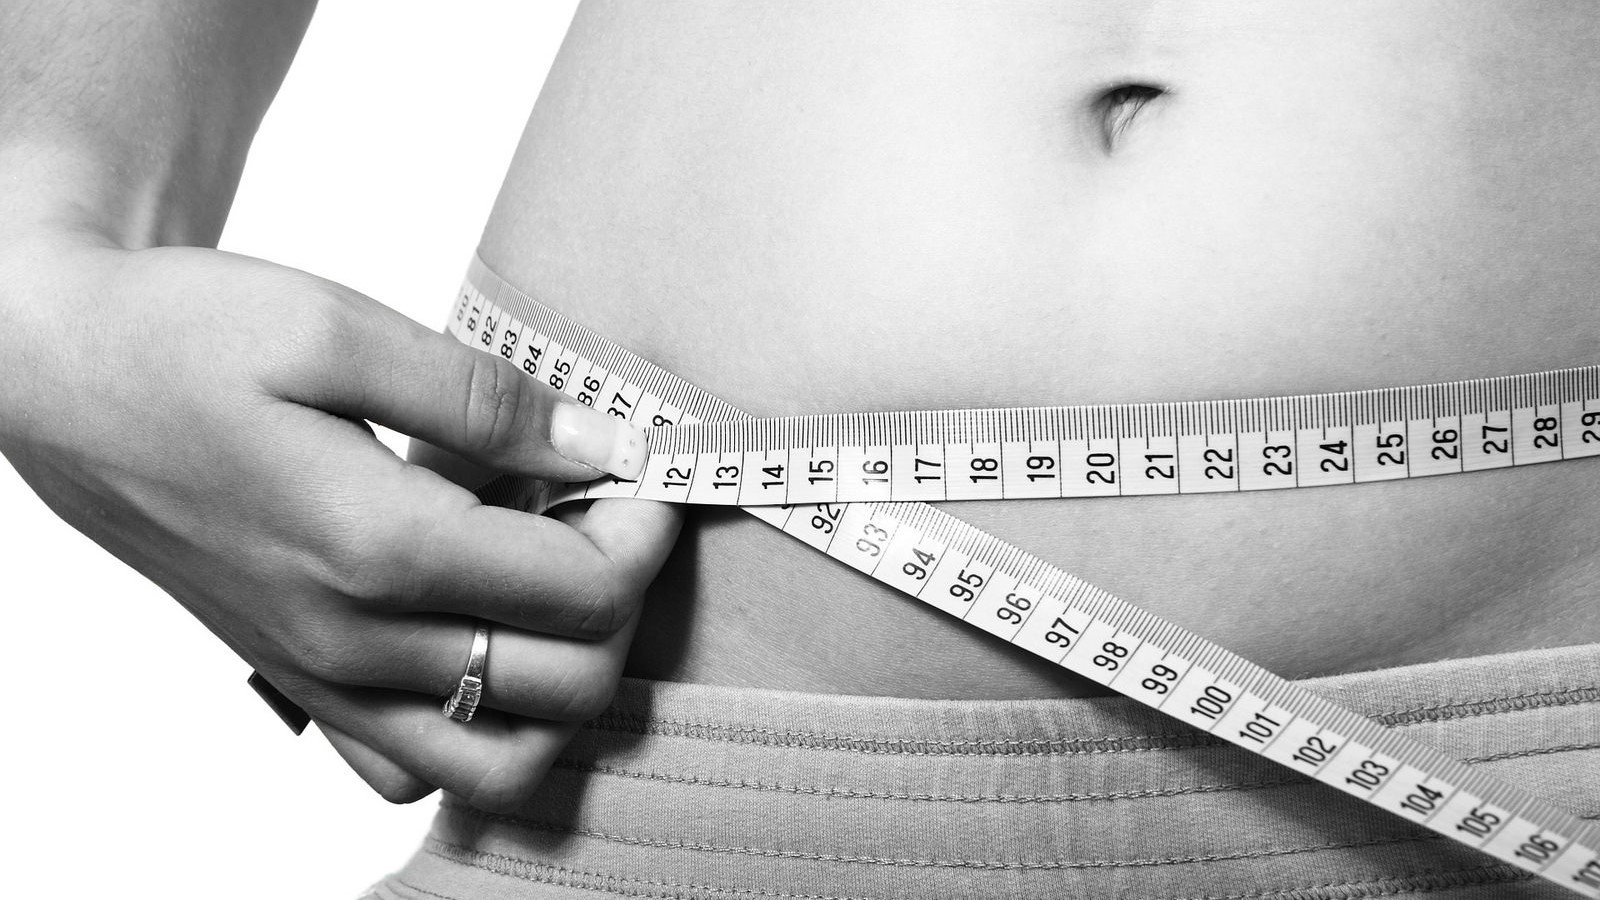 sunt obez si vreau sa slabesc)